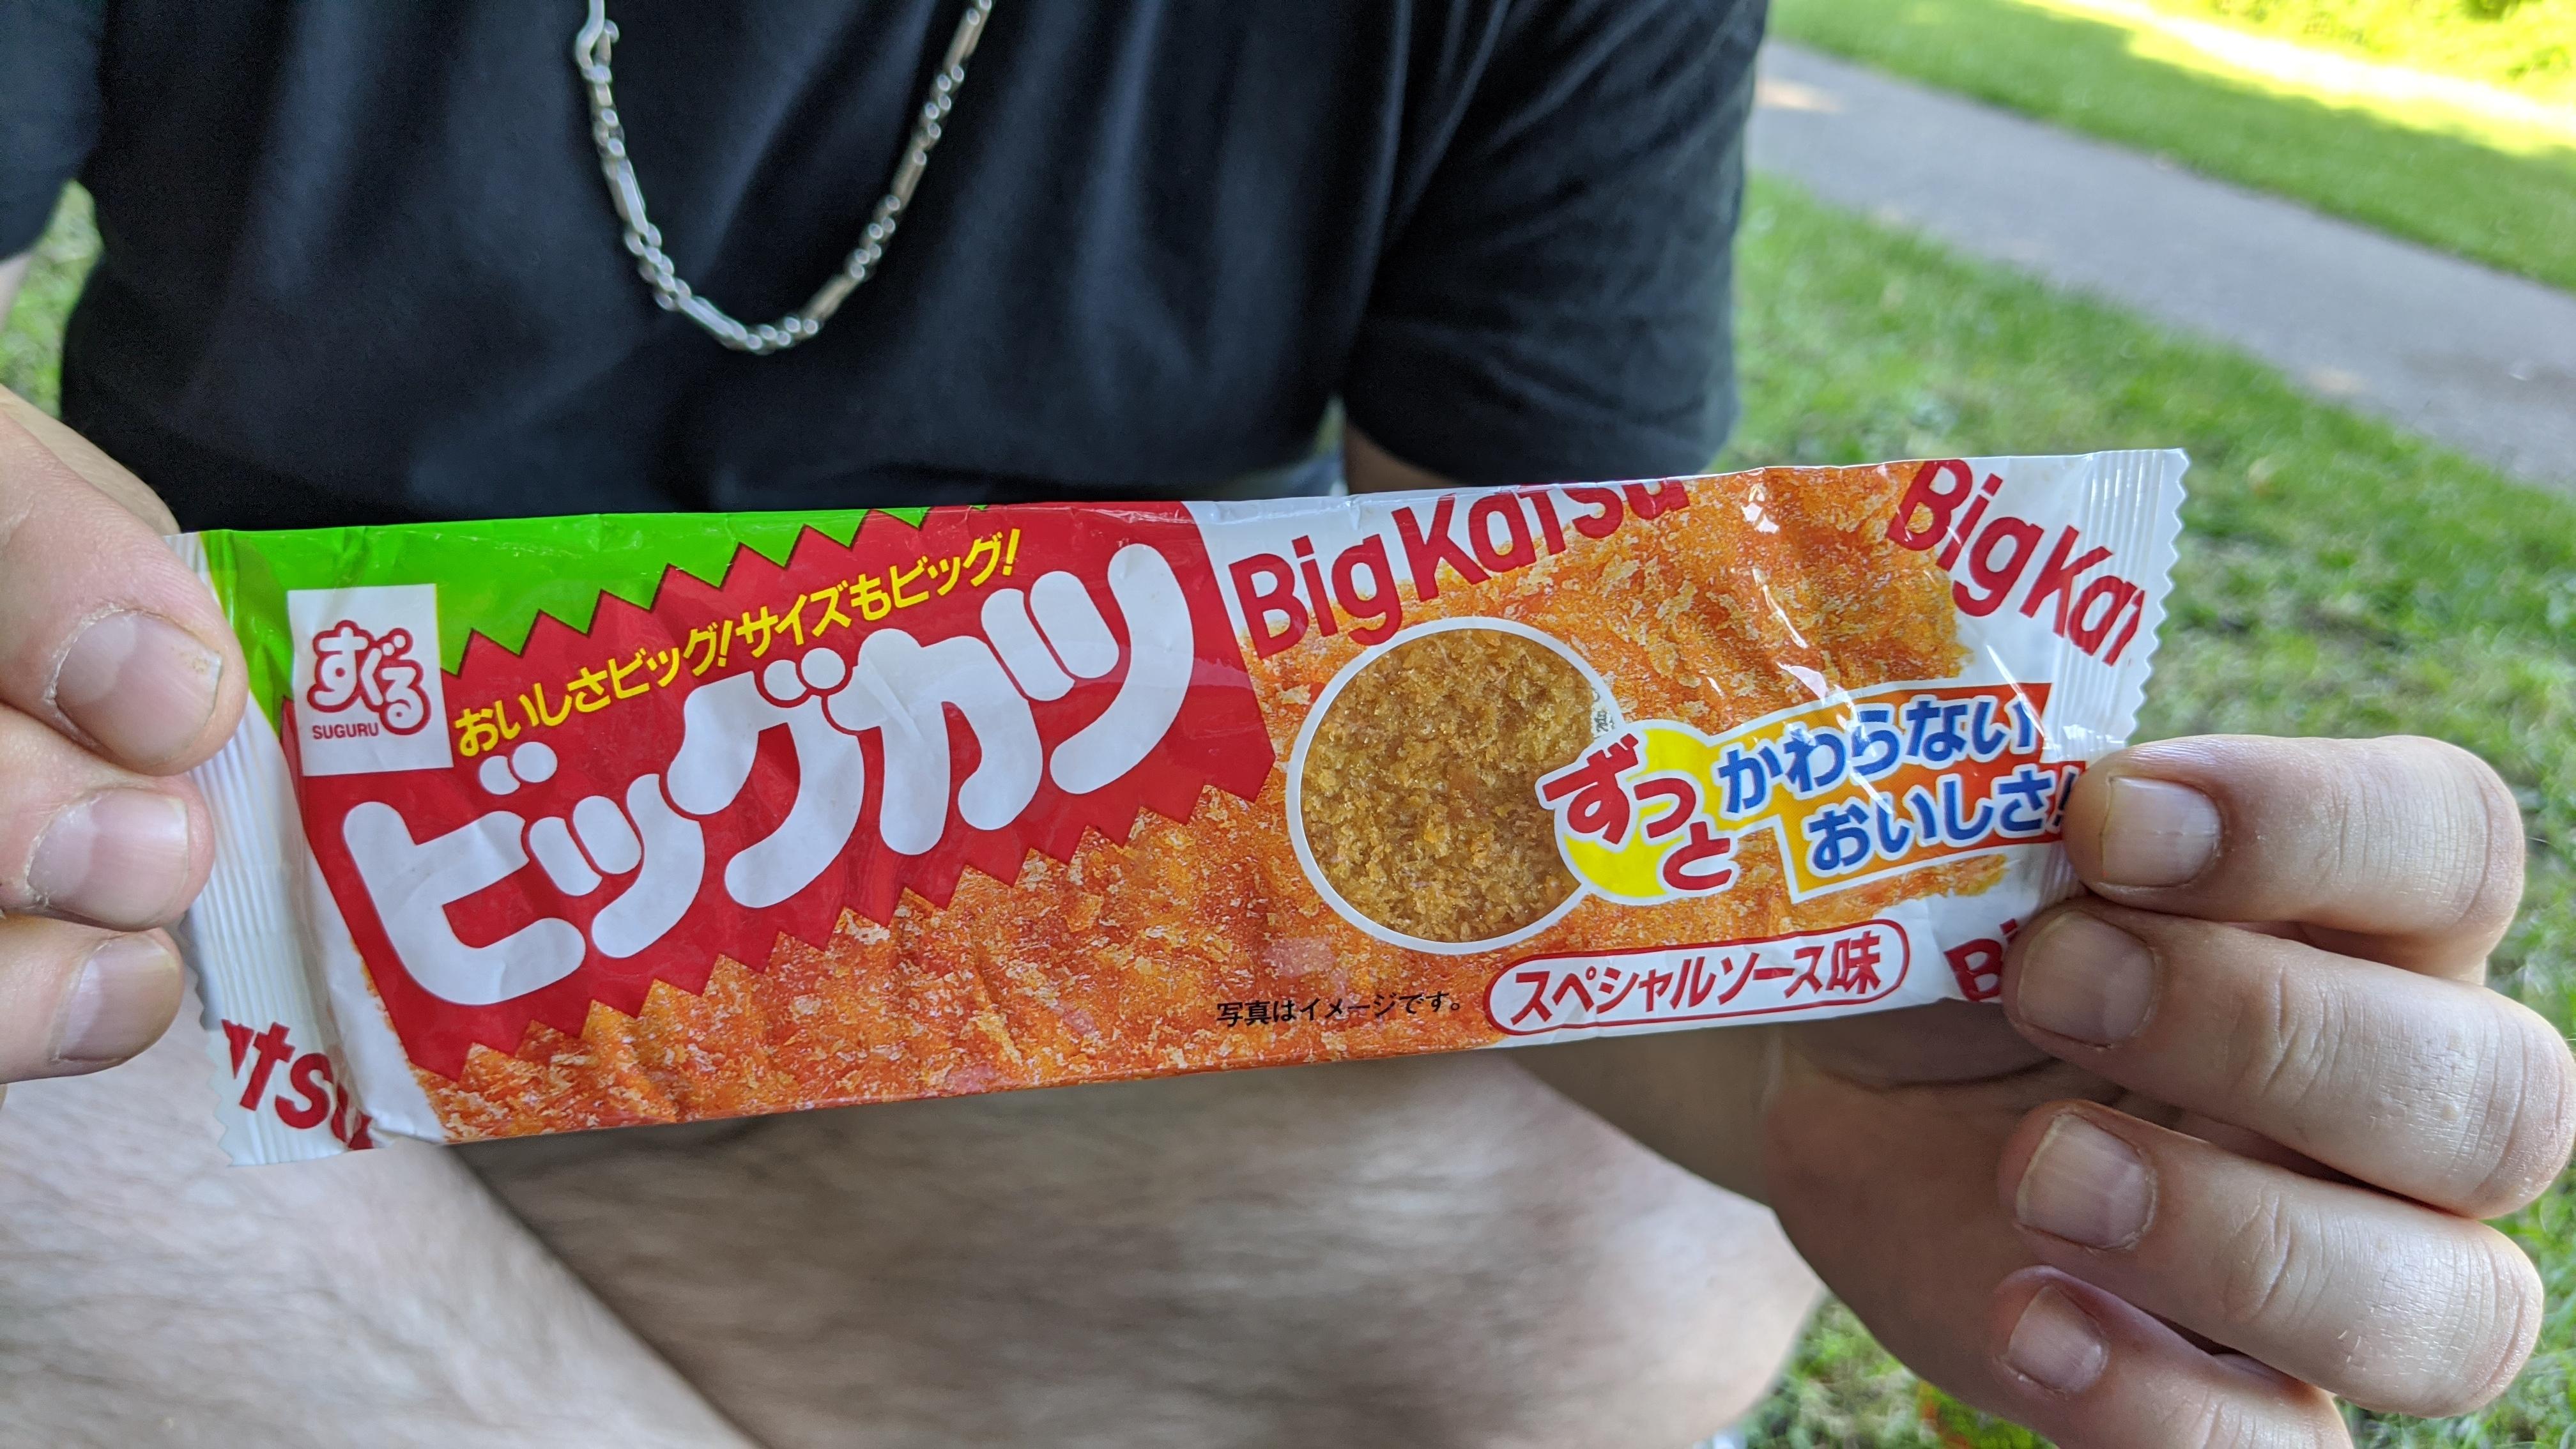 Katsu Snack